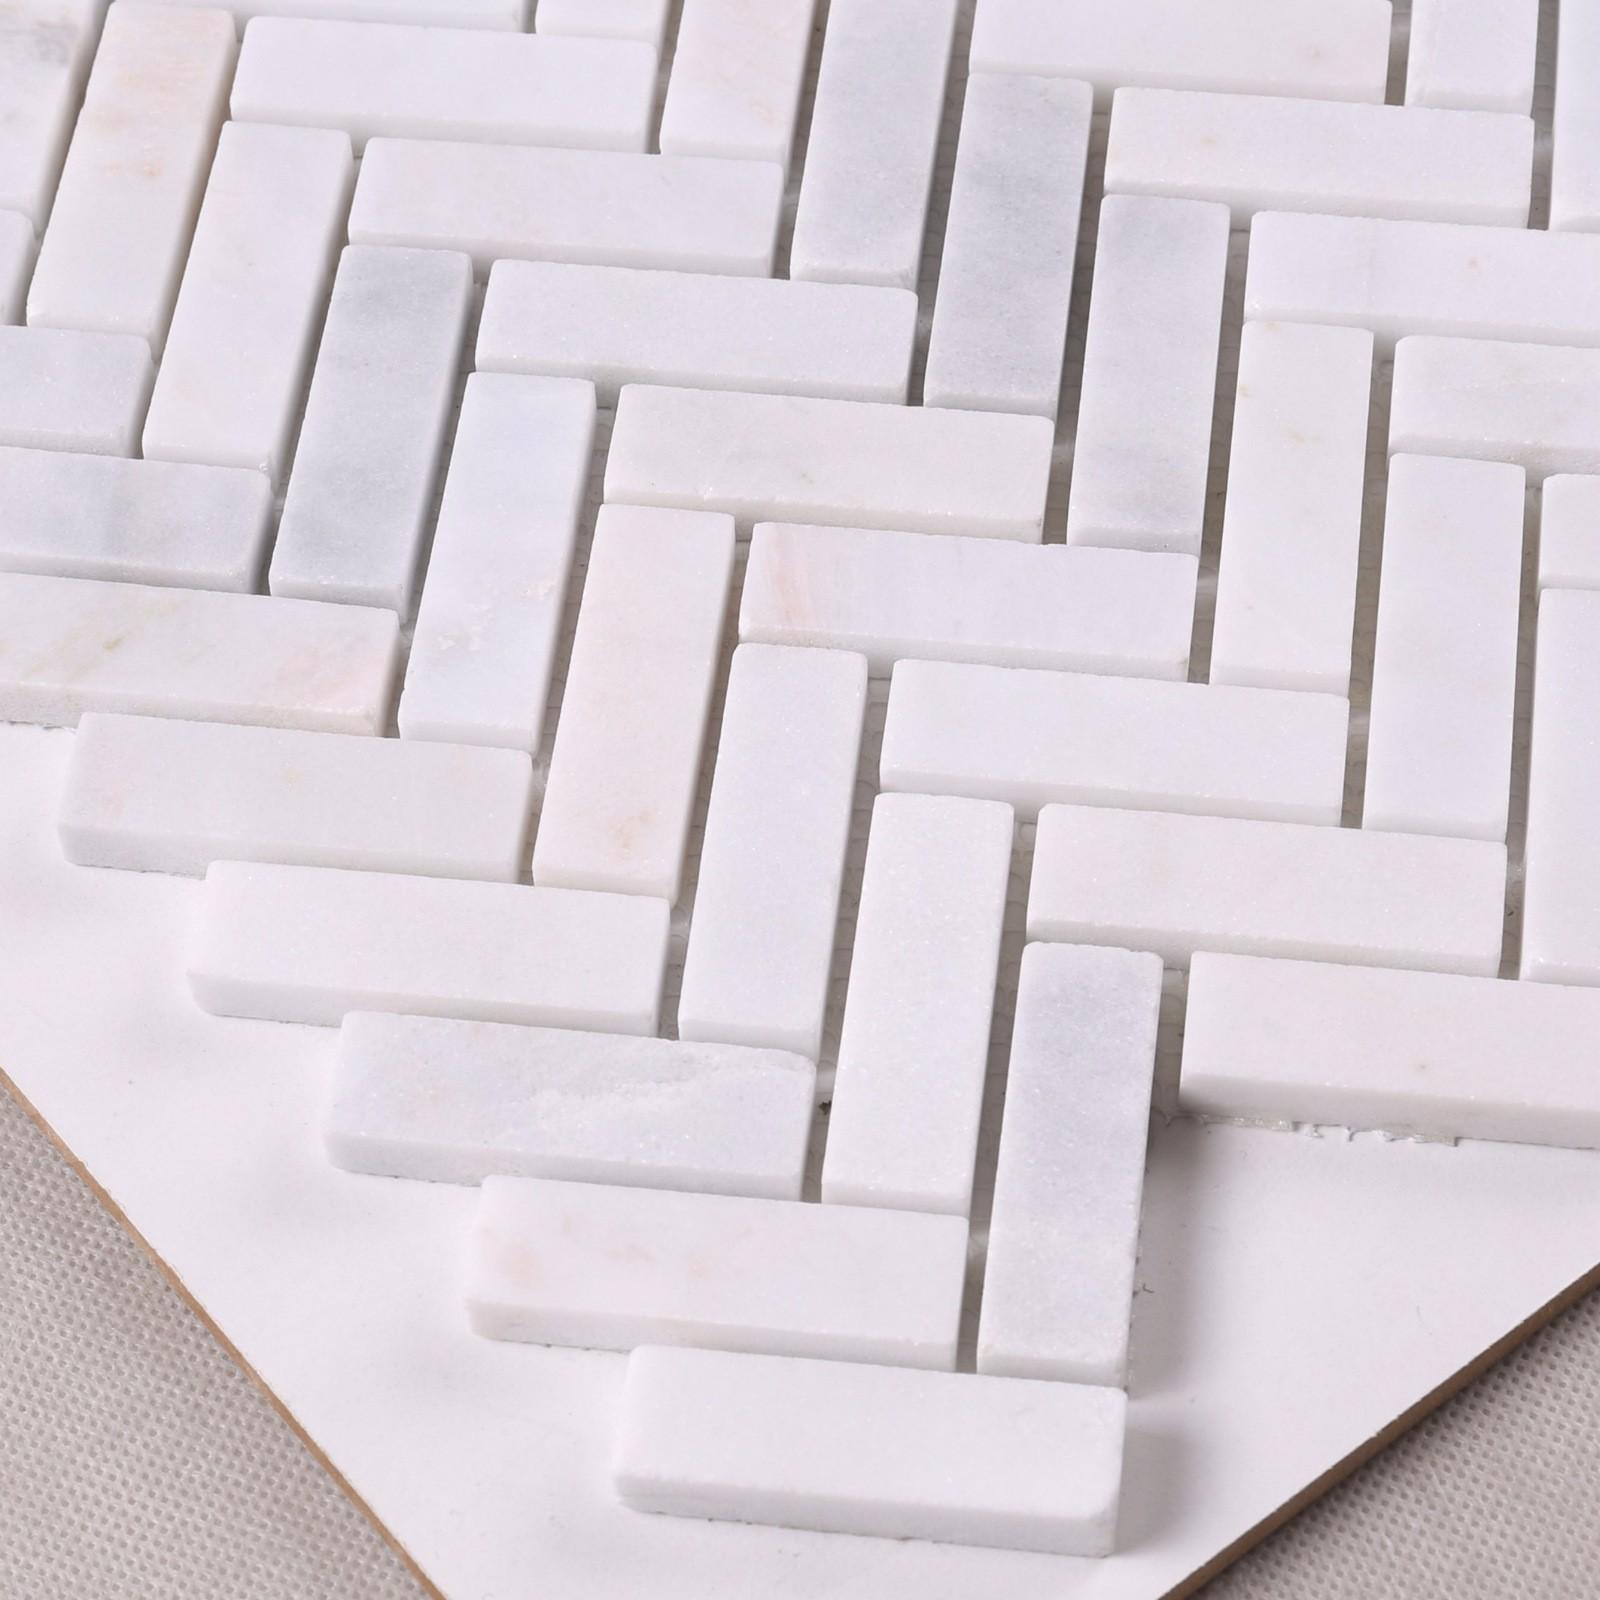 Heng Xing-Custom Stone Tile Manufacturer, Hexagon Carrara Tile | Stone Mosaic Tile-2